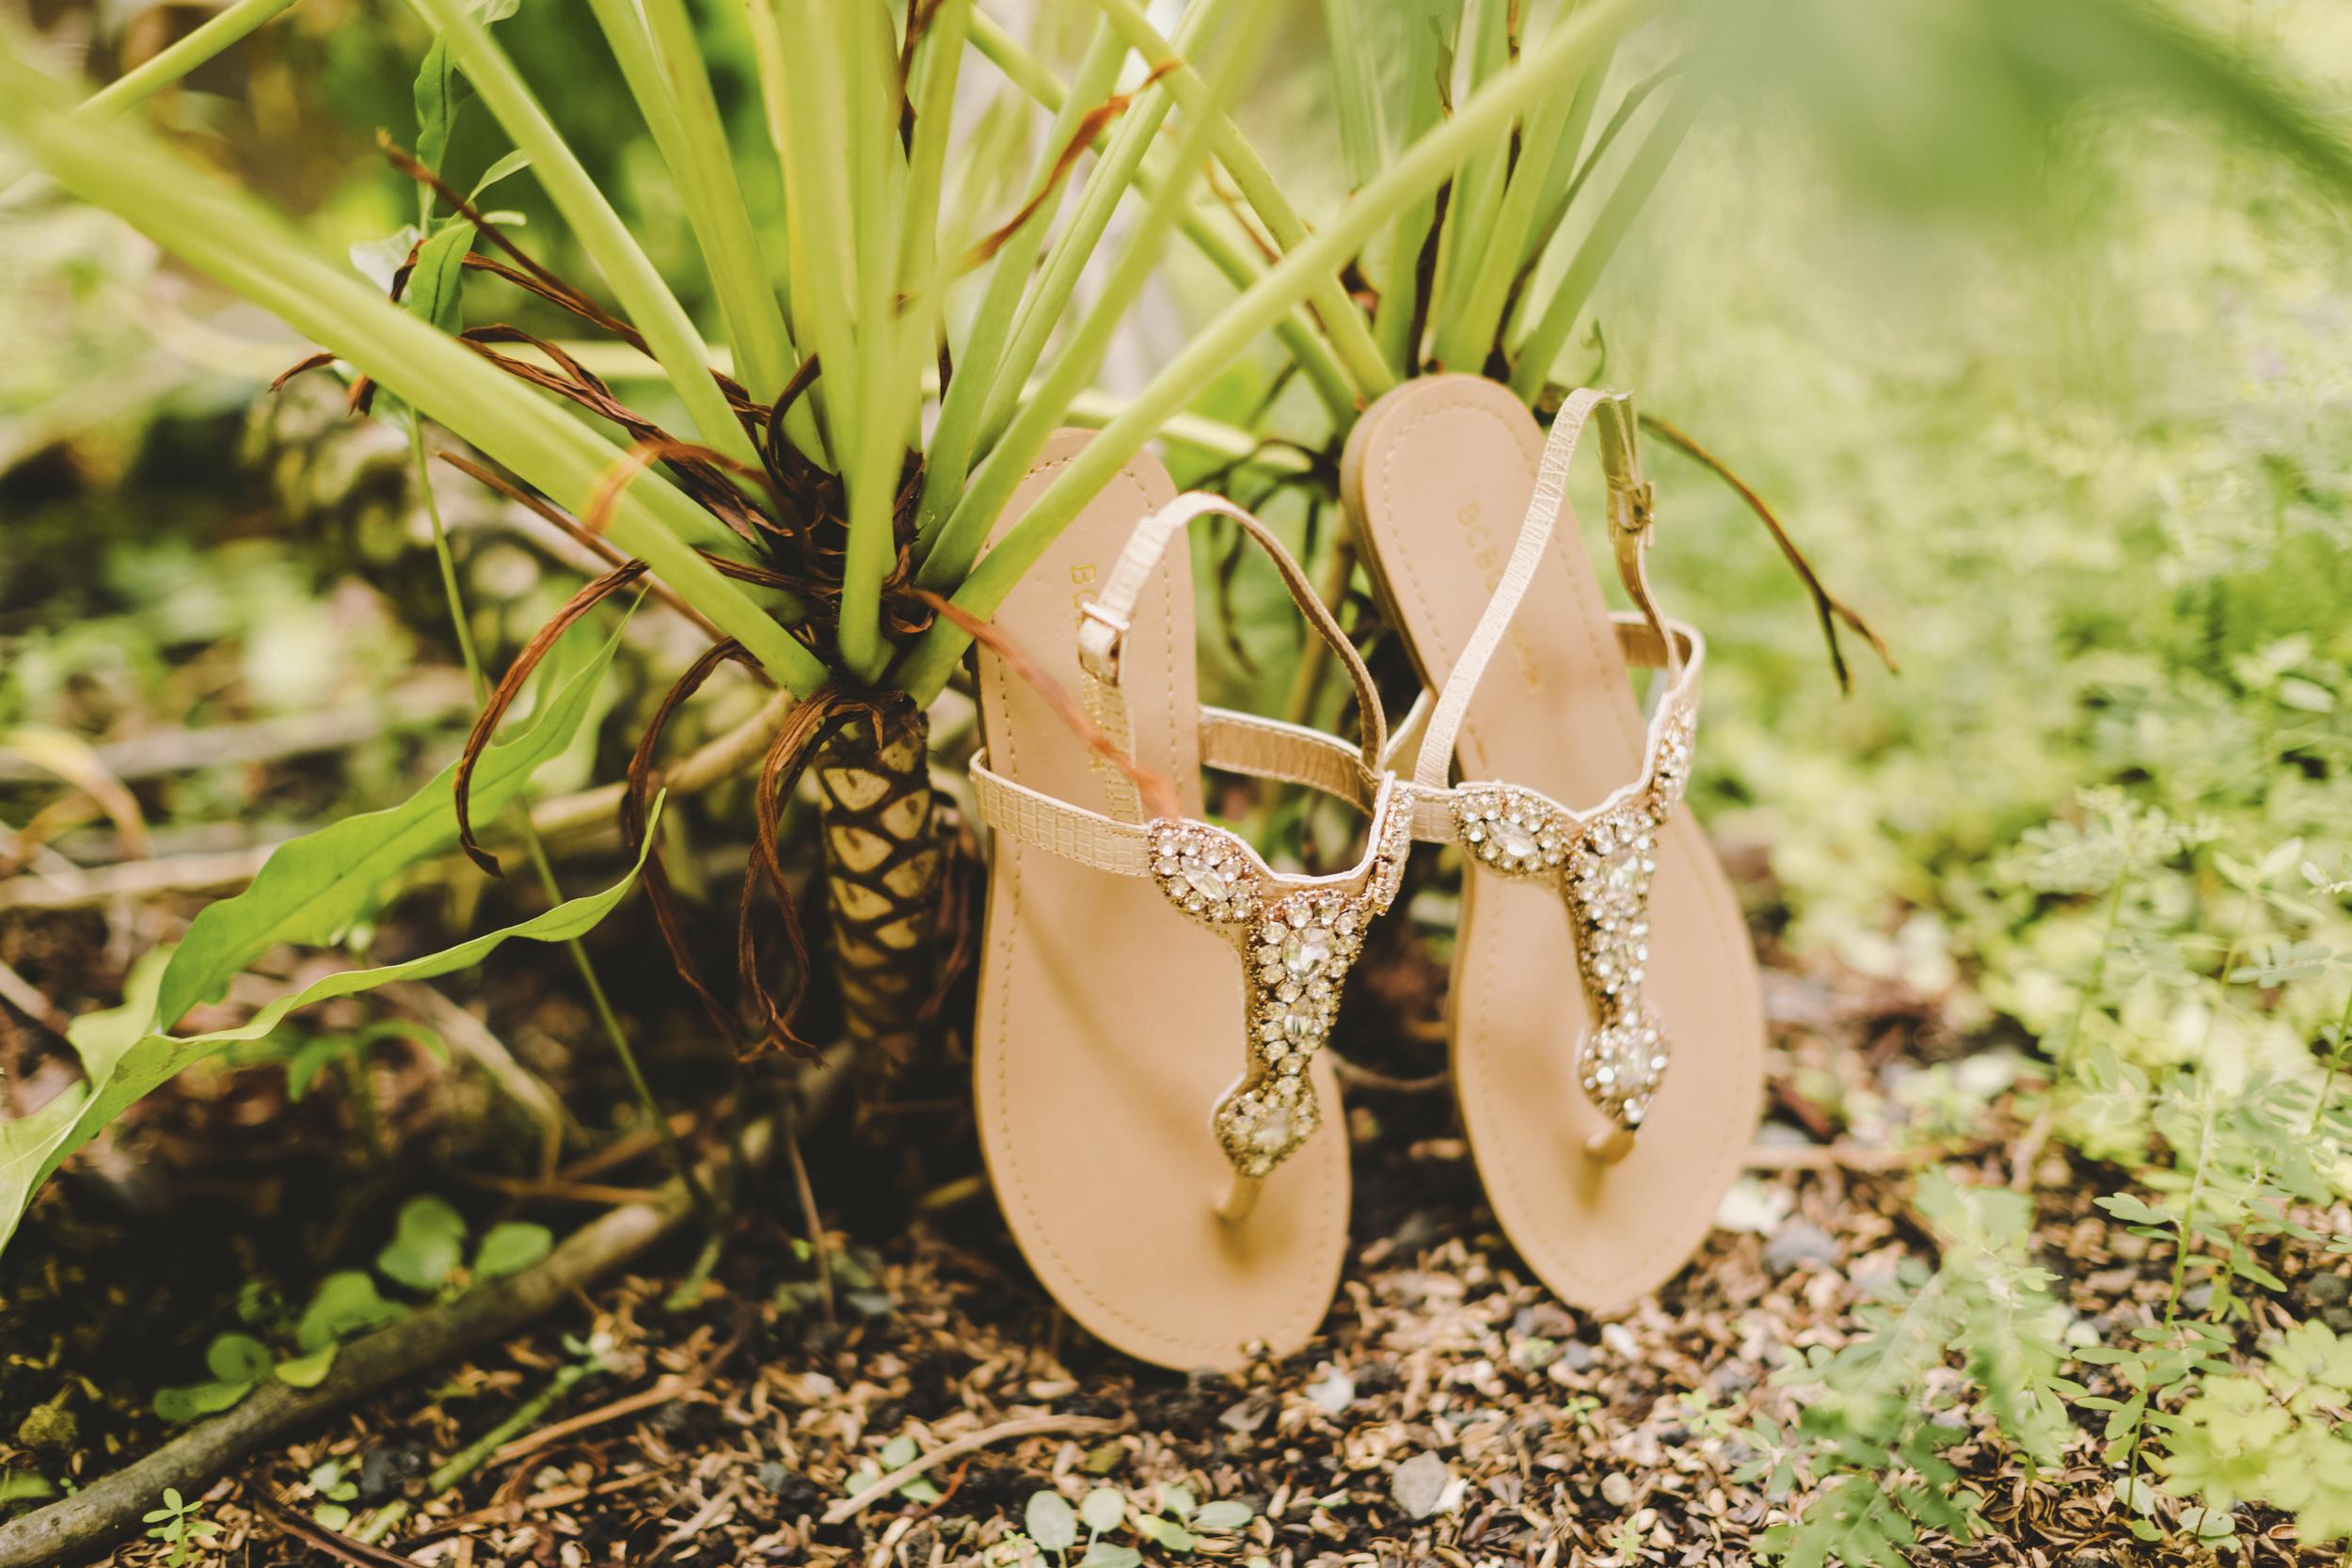 angie-diaz-photography-hawaii-wedding-photographer-kelli-jay-9.jpg